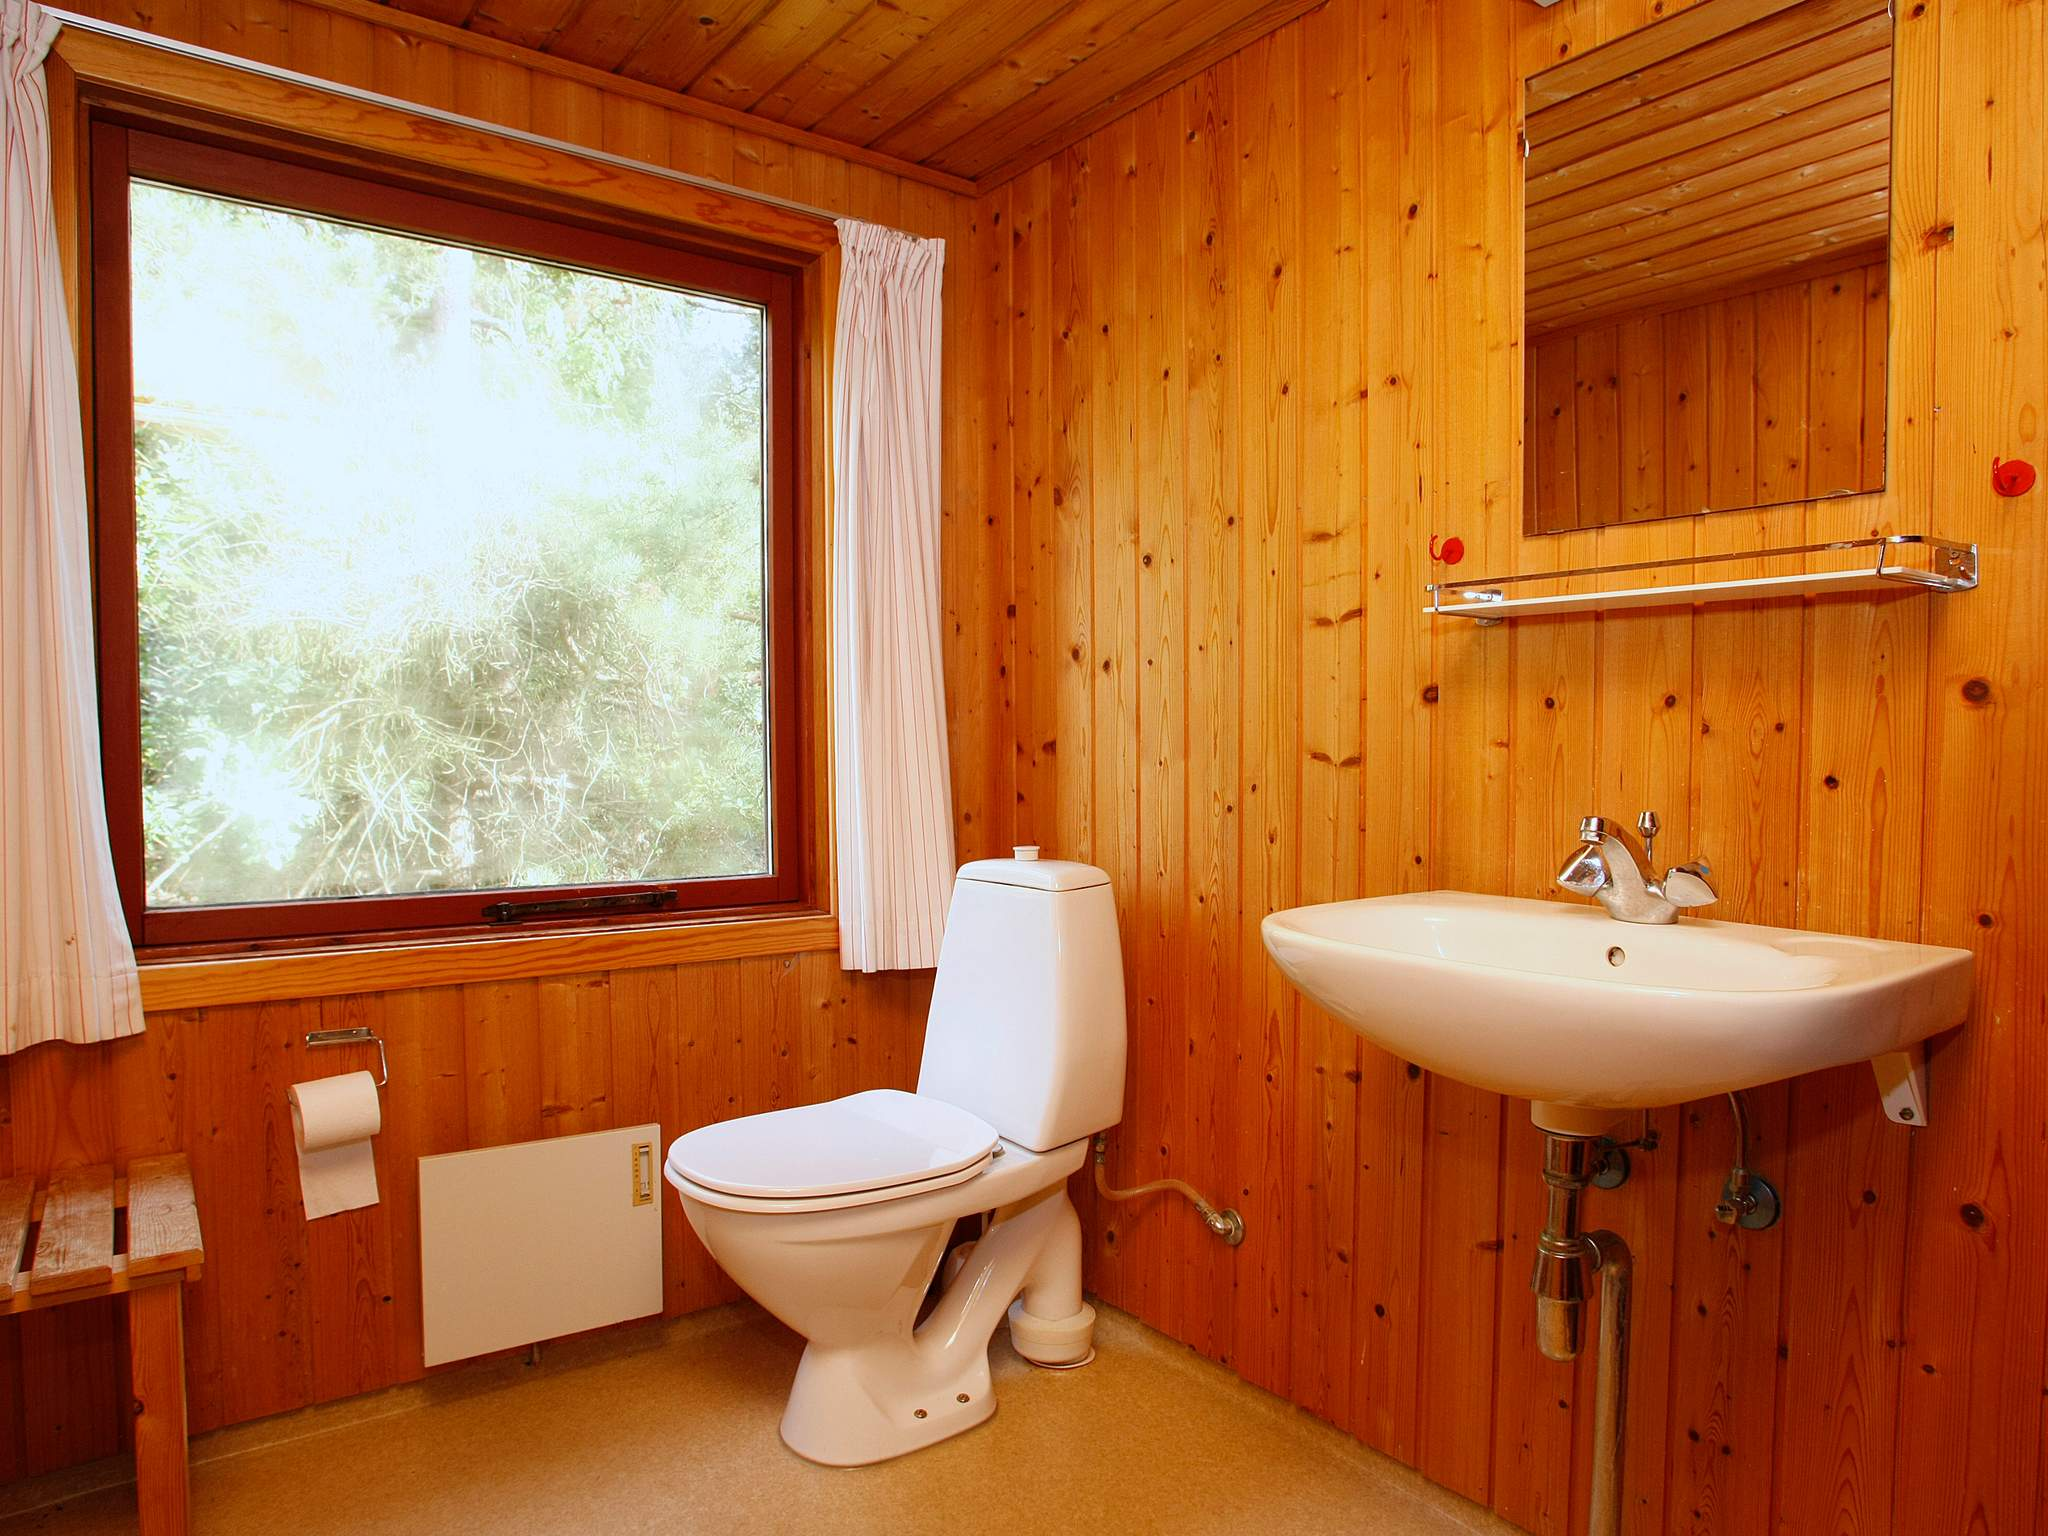 Ferienhaus Læsø/Vesterø (88181), Læsø, , Læsø, Dänemark, Bild 10